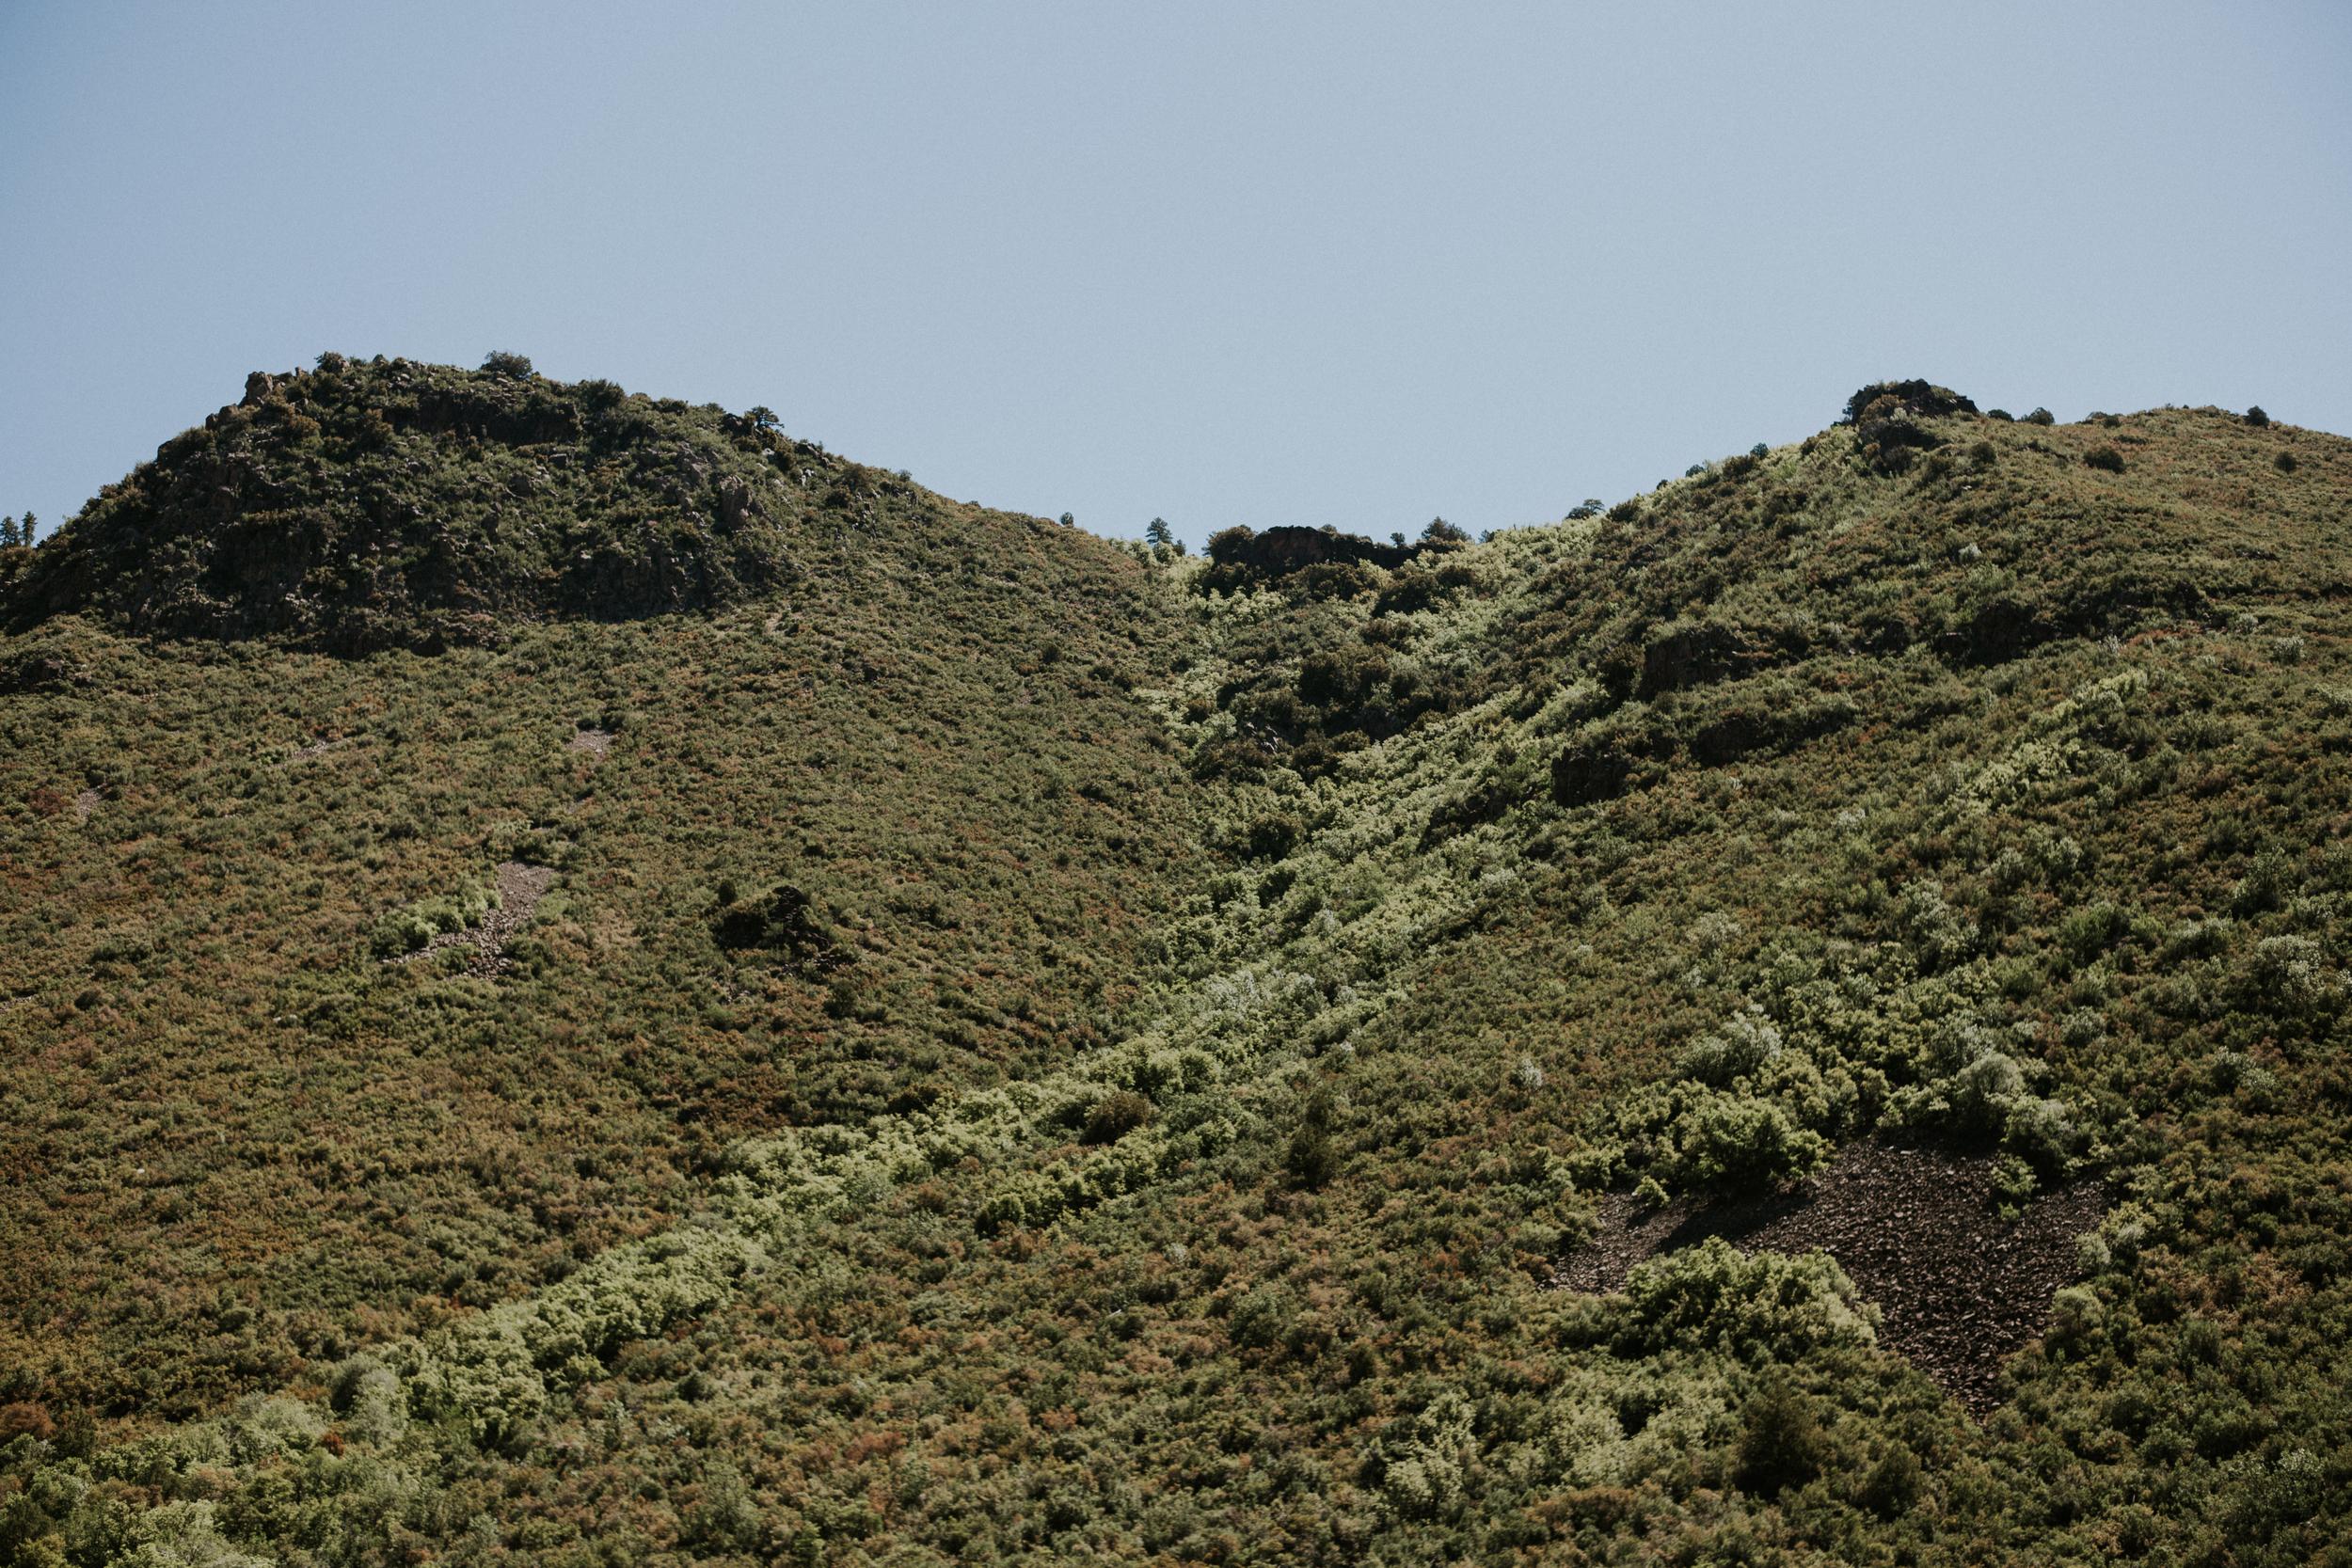 Sedona - AZ - Arizona - Hiking - Slide Rock - Adventure - Las Vegas Photographer - Photographer - Photography - Kamra Fuller Photography - Arizona Photography - Sedona Photography - Travel Photography - Travel Photographer - Travel - River - National Park